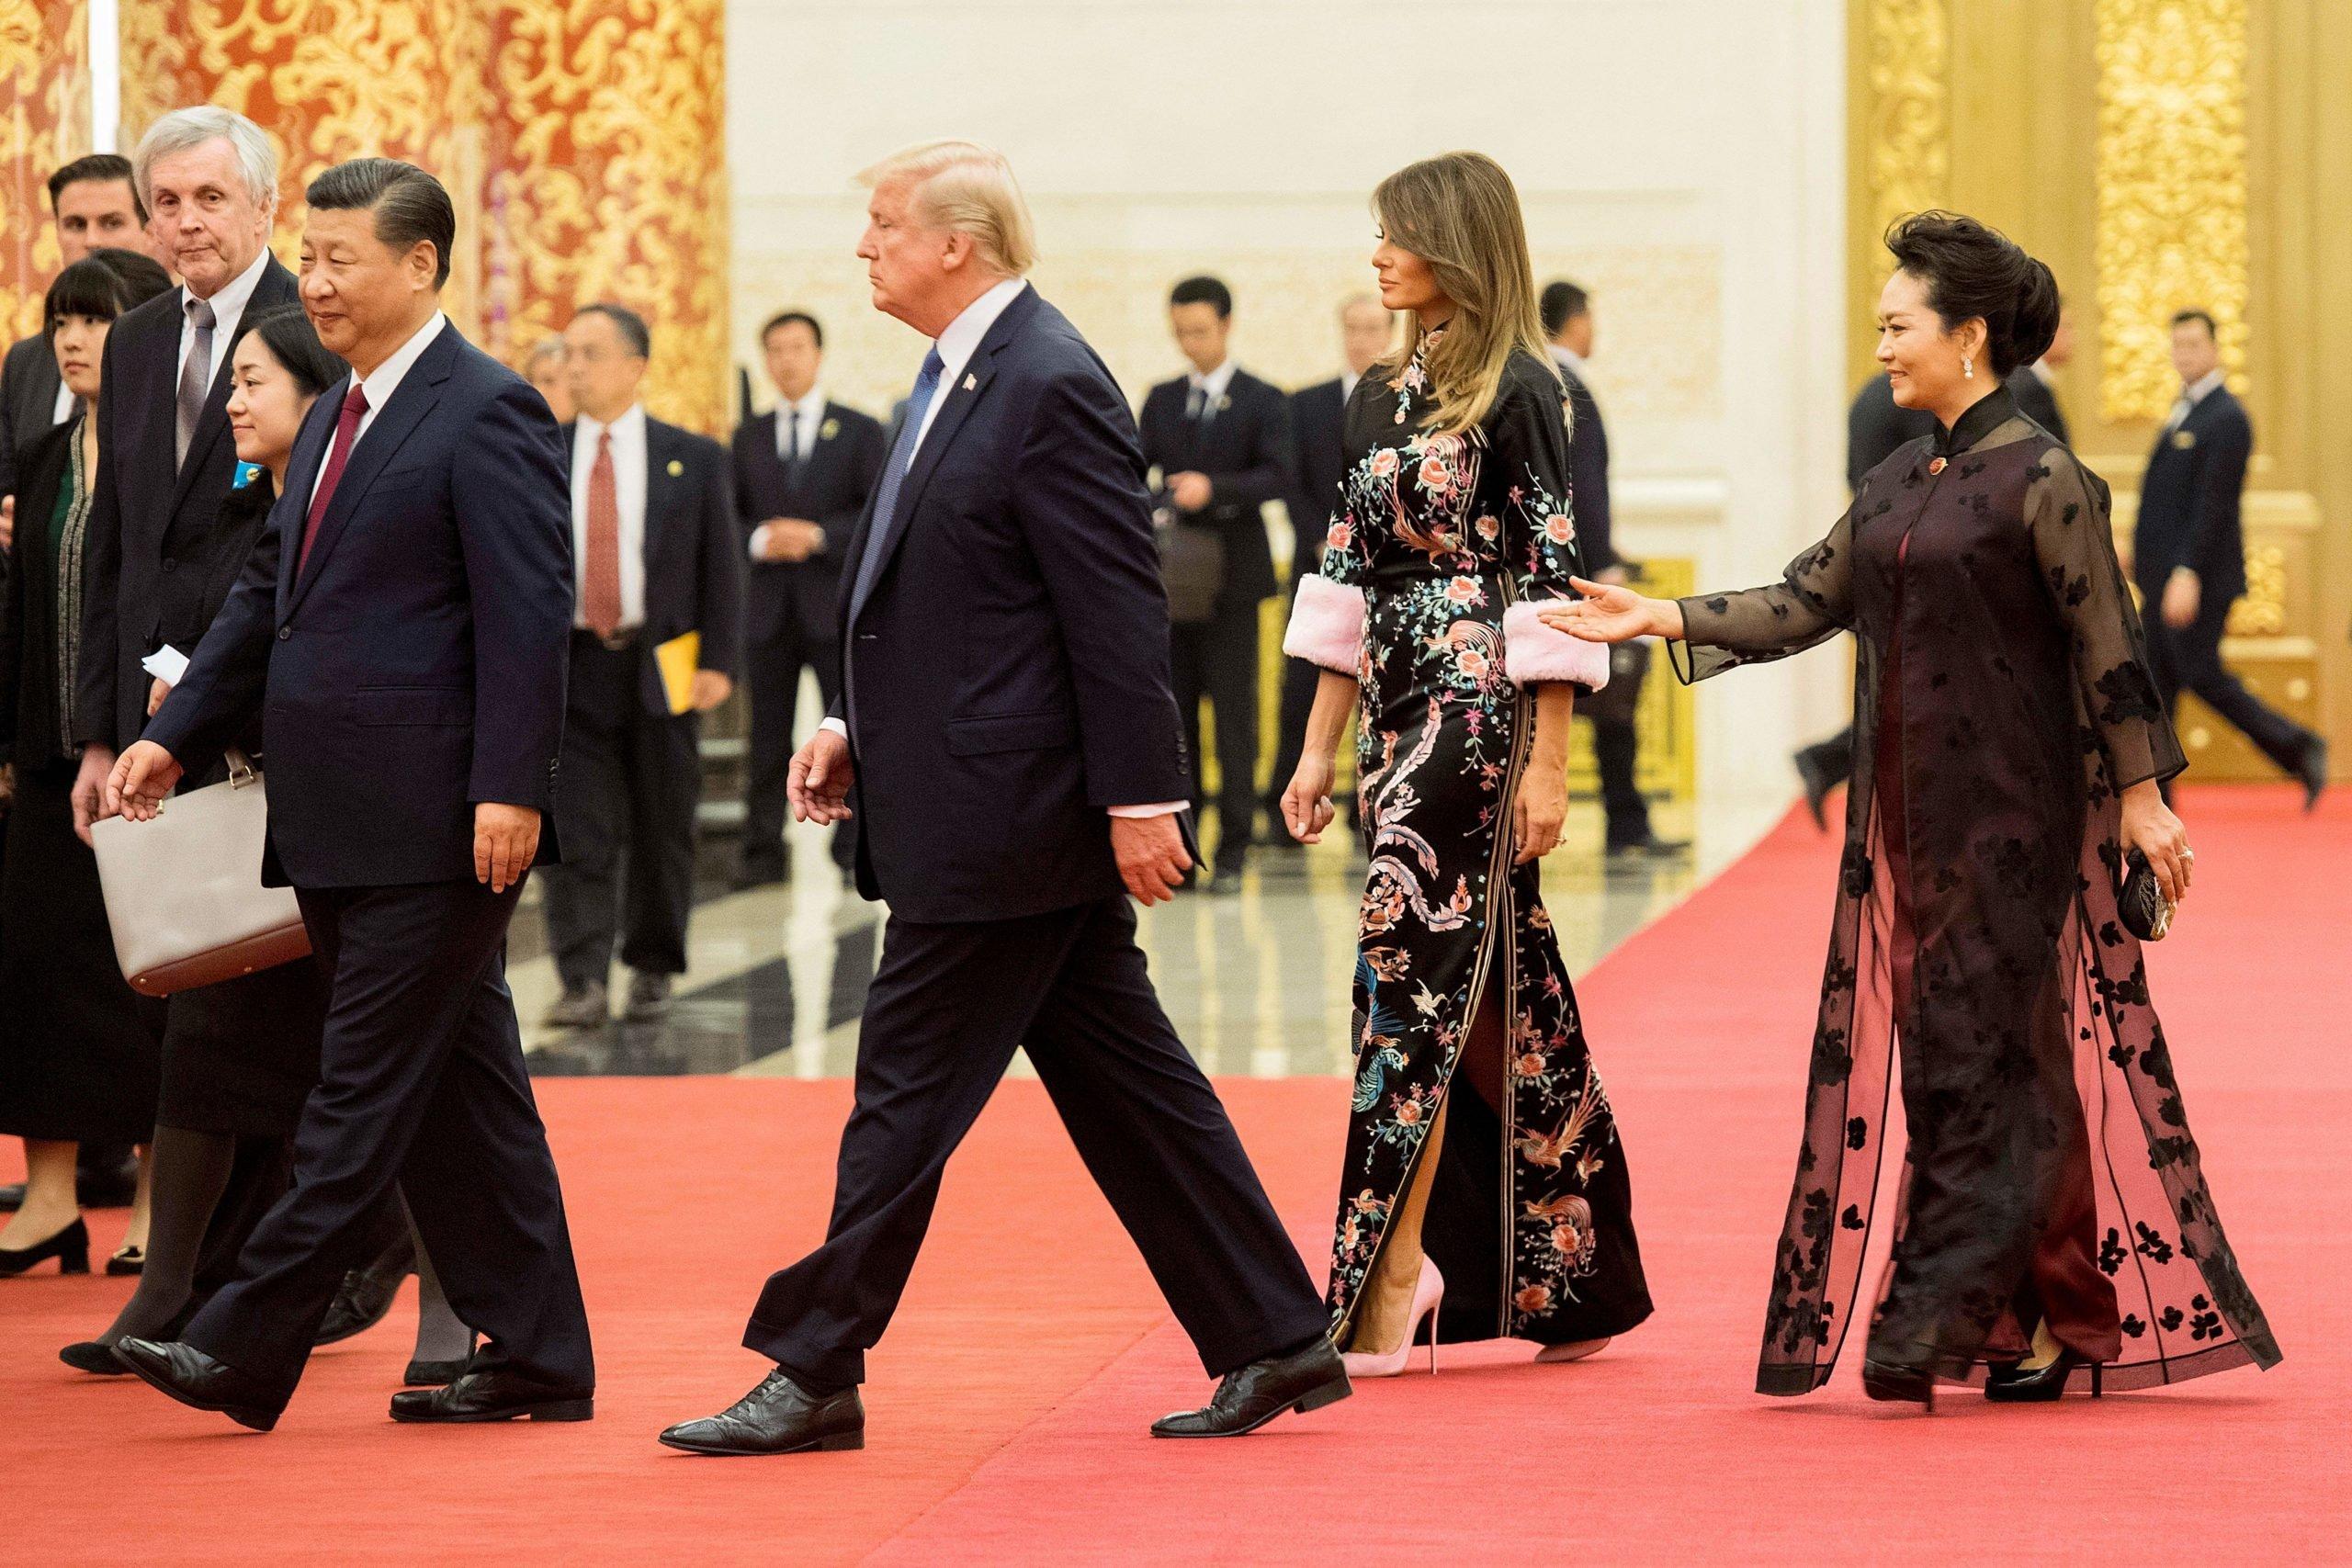 Melania Trump (Photo credit: JIM WATSON/AFP via Getty Images)